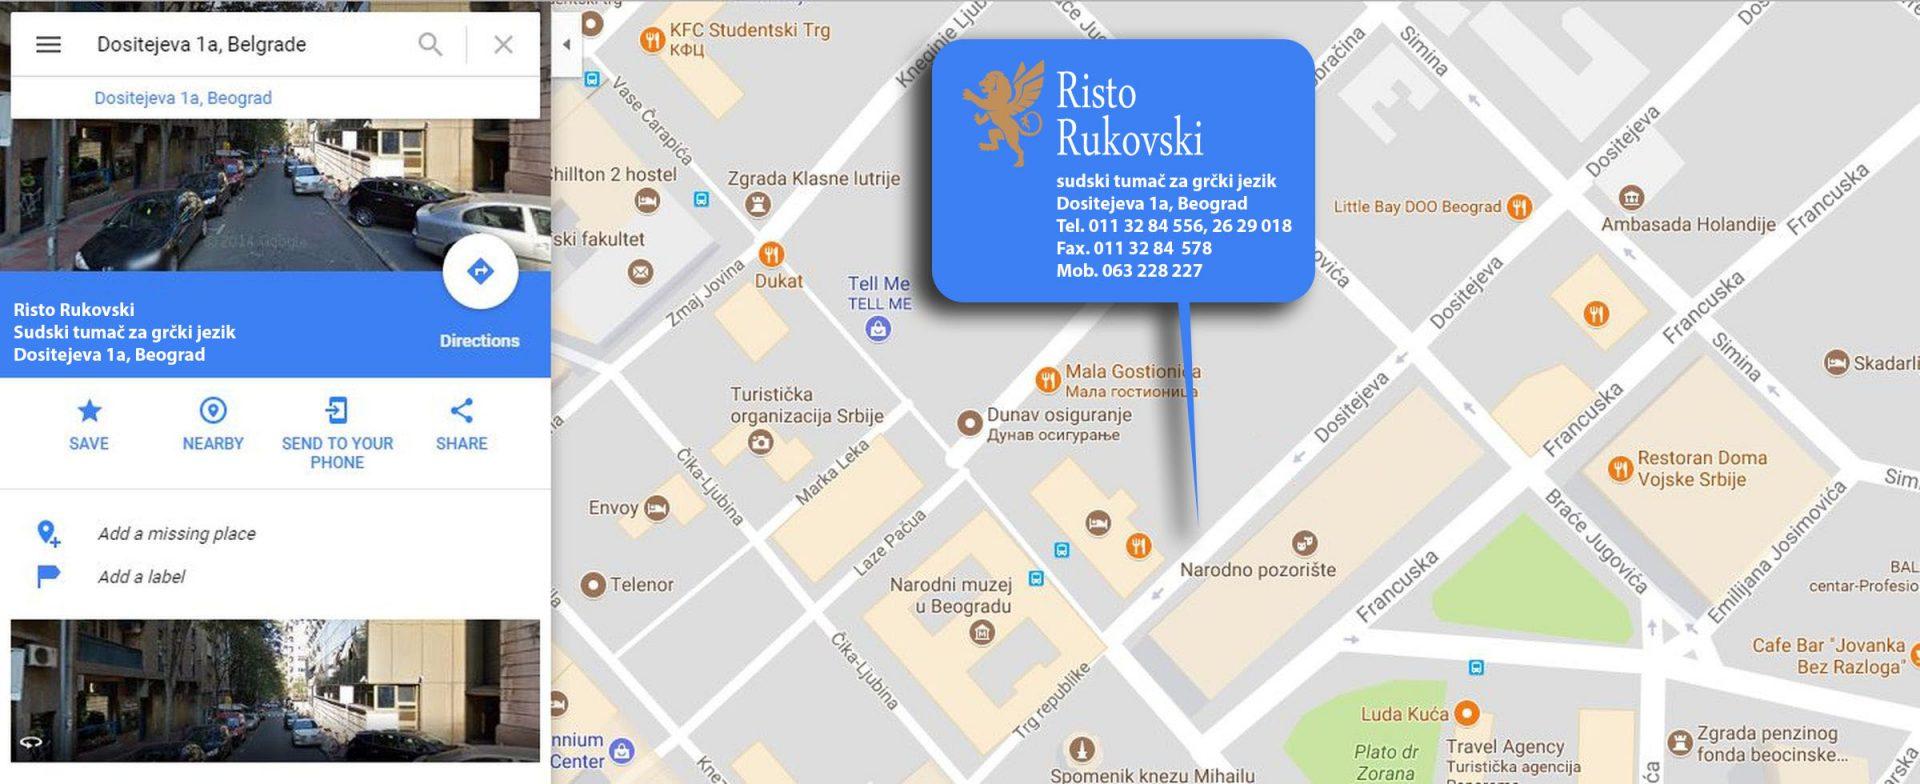 Dositejeva1a_google_mapa